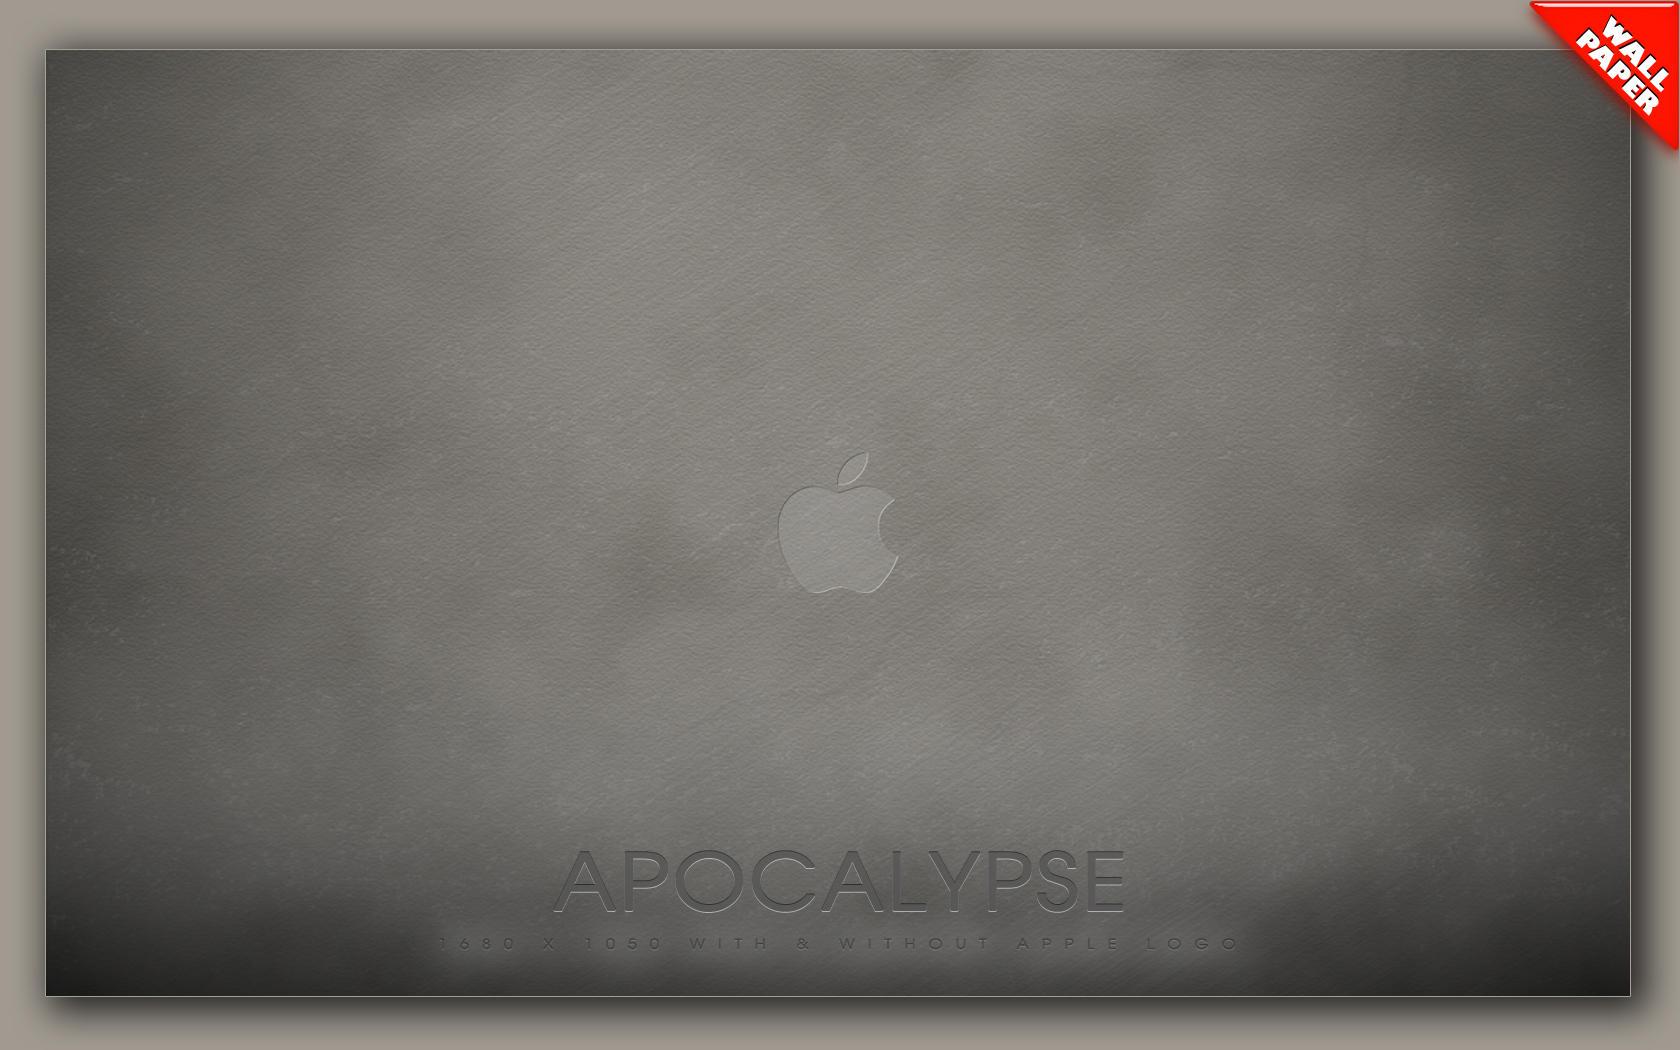 apocalypse by hotiron